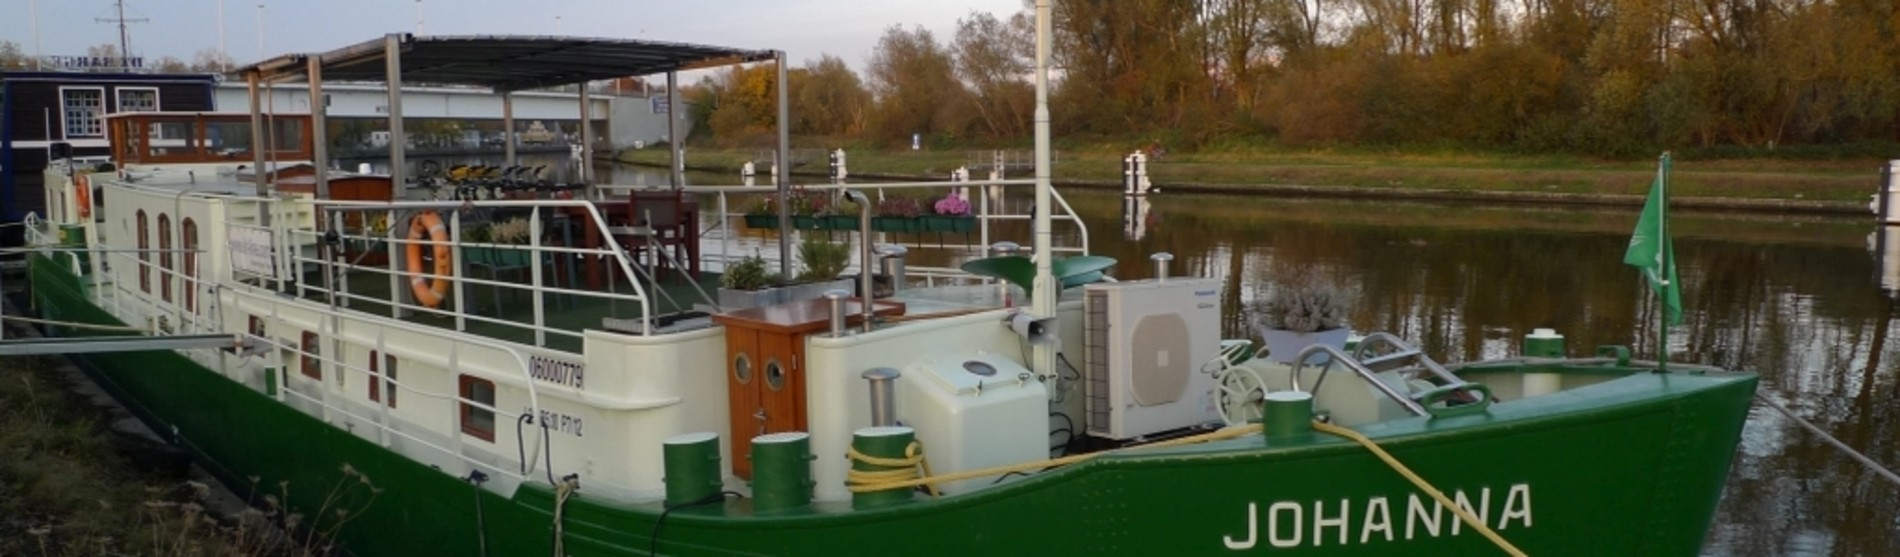 B&B Barge Johanna à Bruges